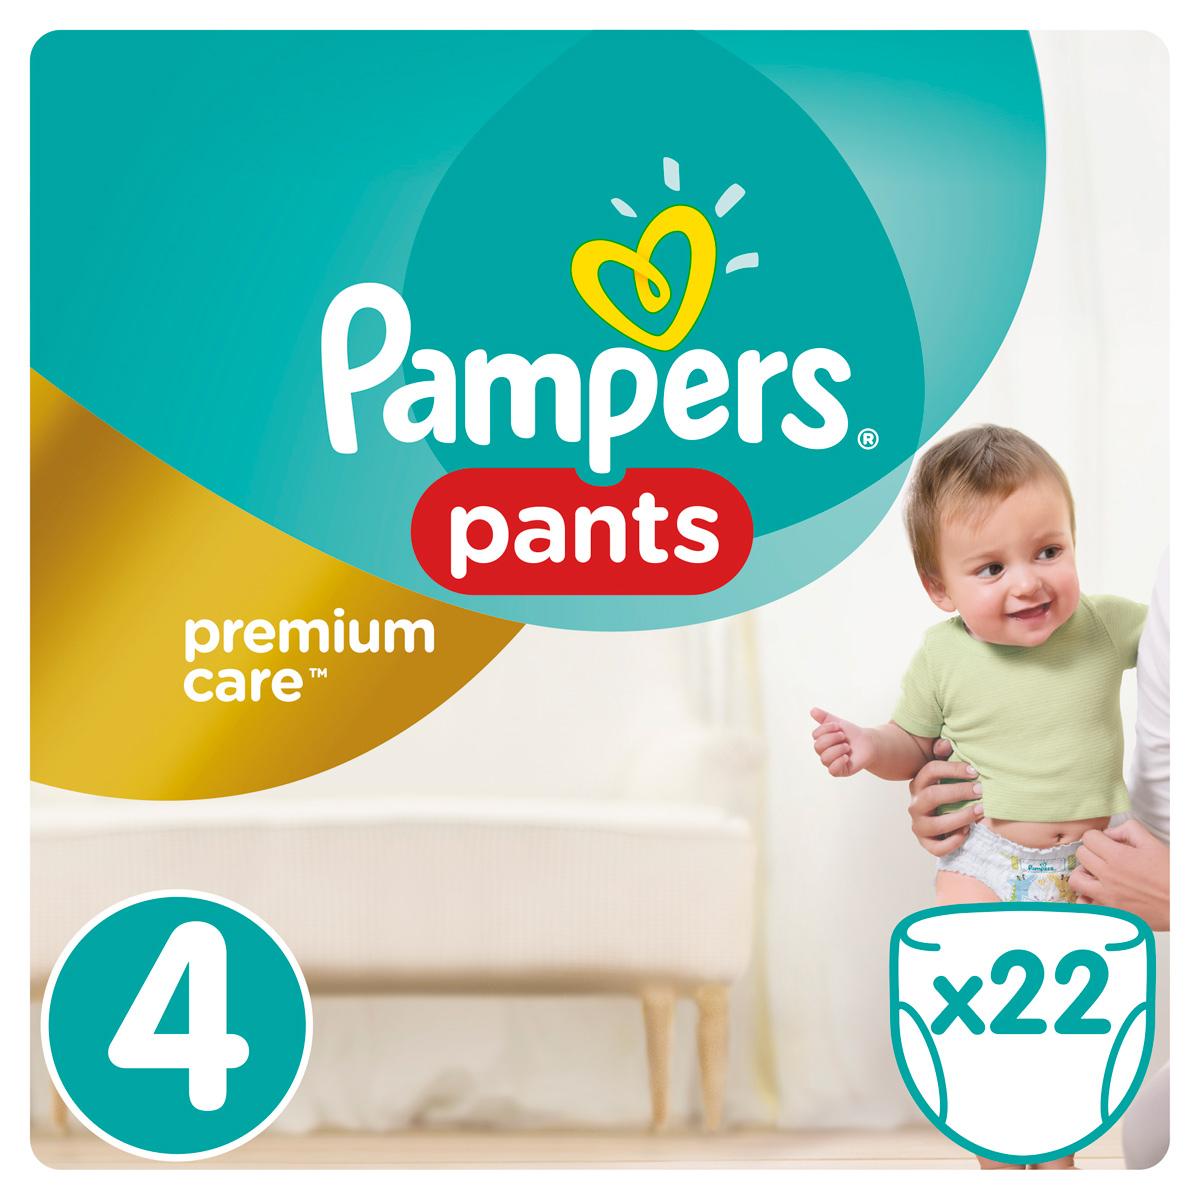 Pampers Pants Трусики Premium Care 9-14 кг (размер 4) 22 шт трусики подгузники pampers premium care pants maxi 9 14 кг средняя упаковка 22 шт